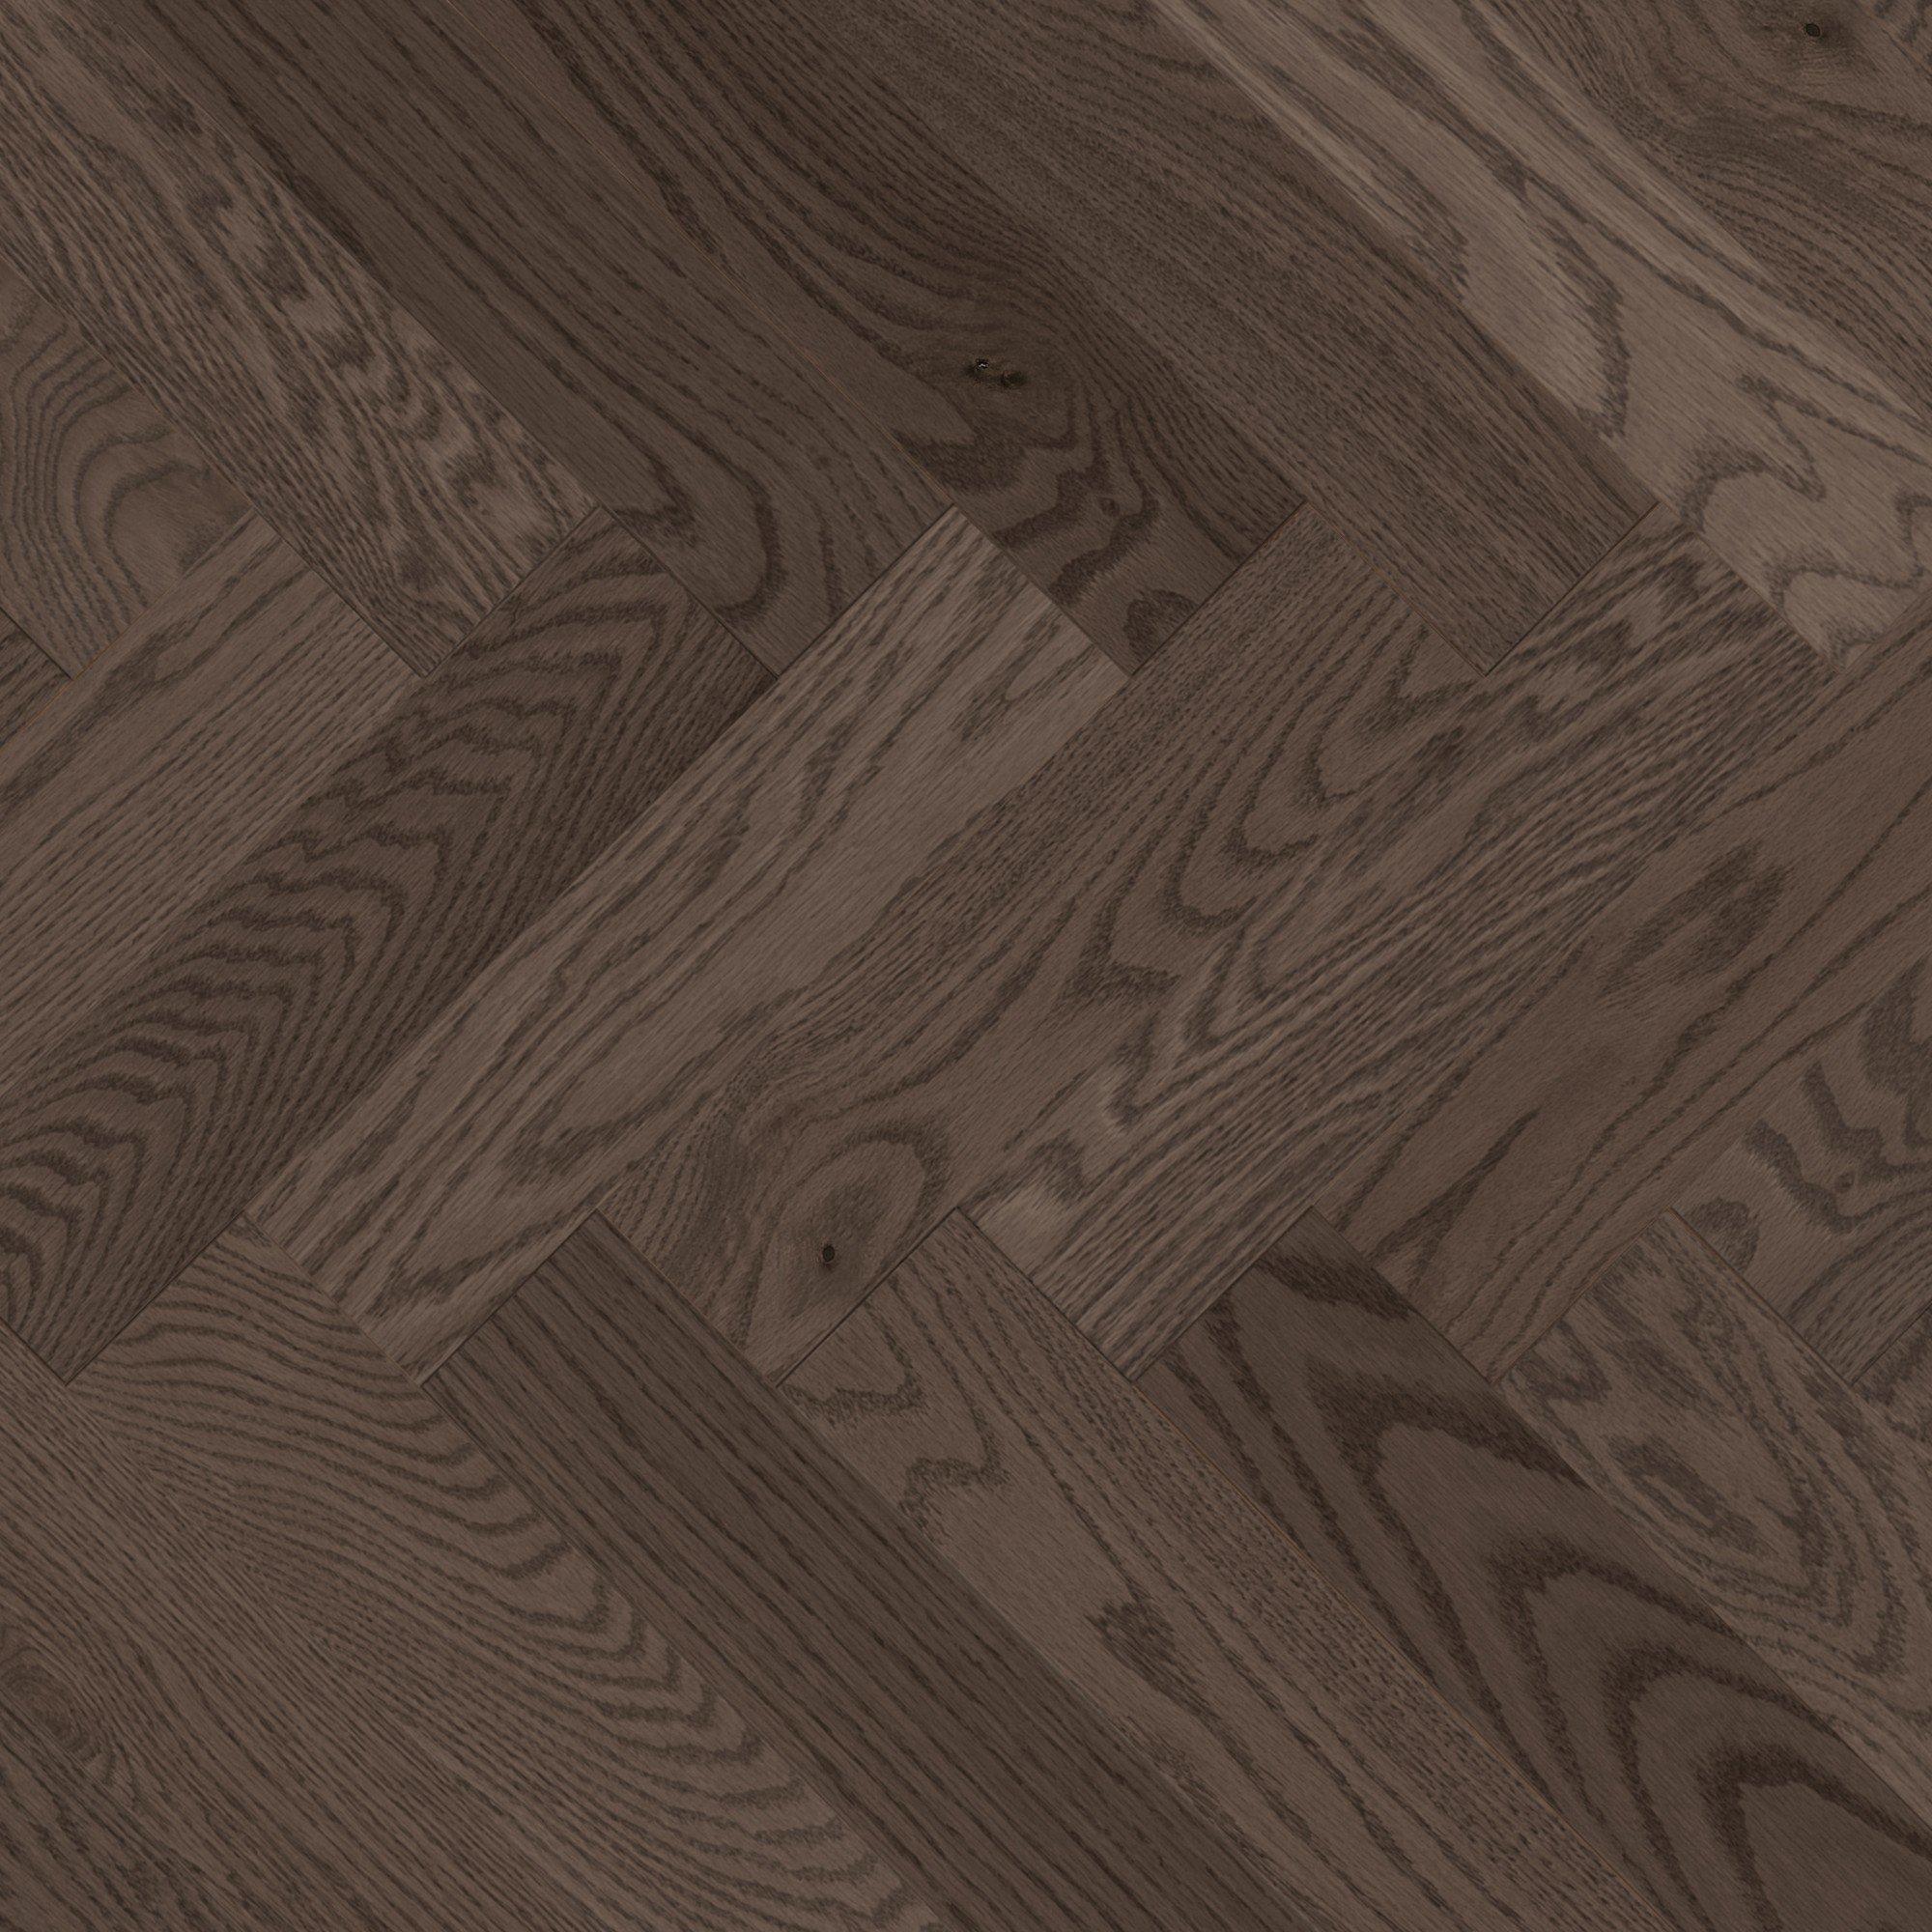 Red Oak Platinum Exclusive Smooth - Floor image